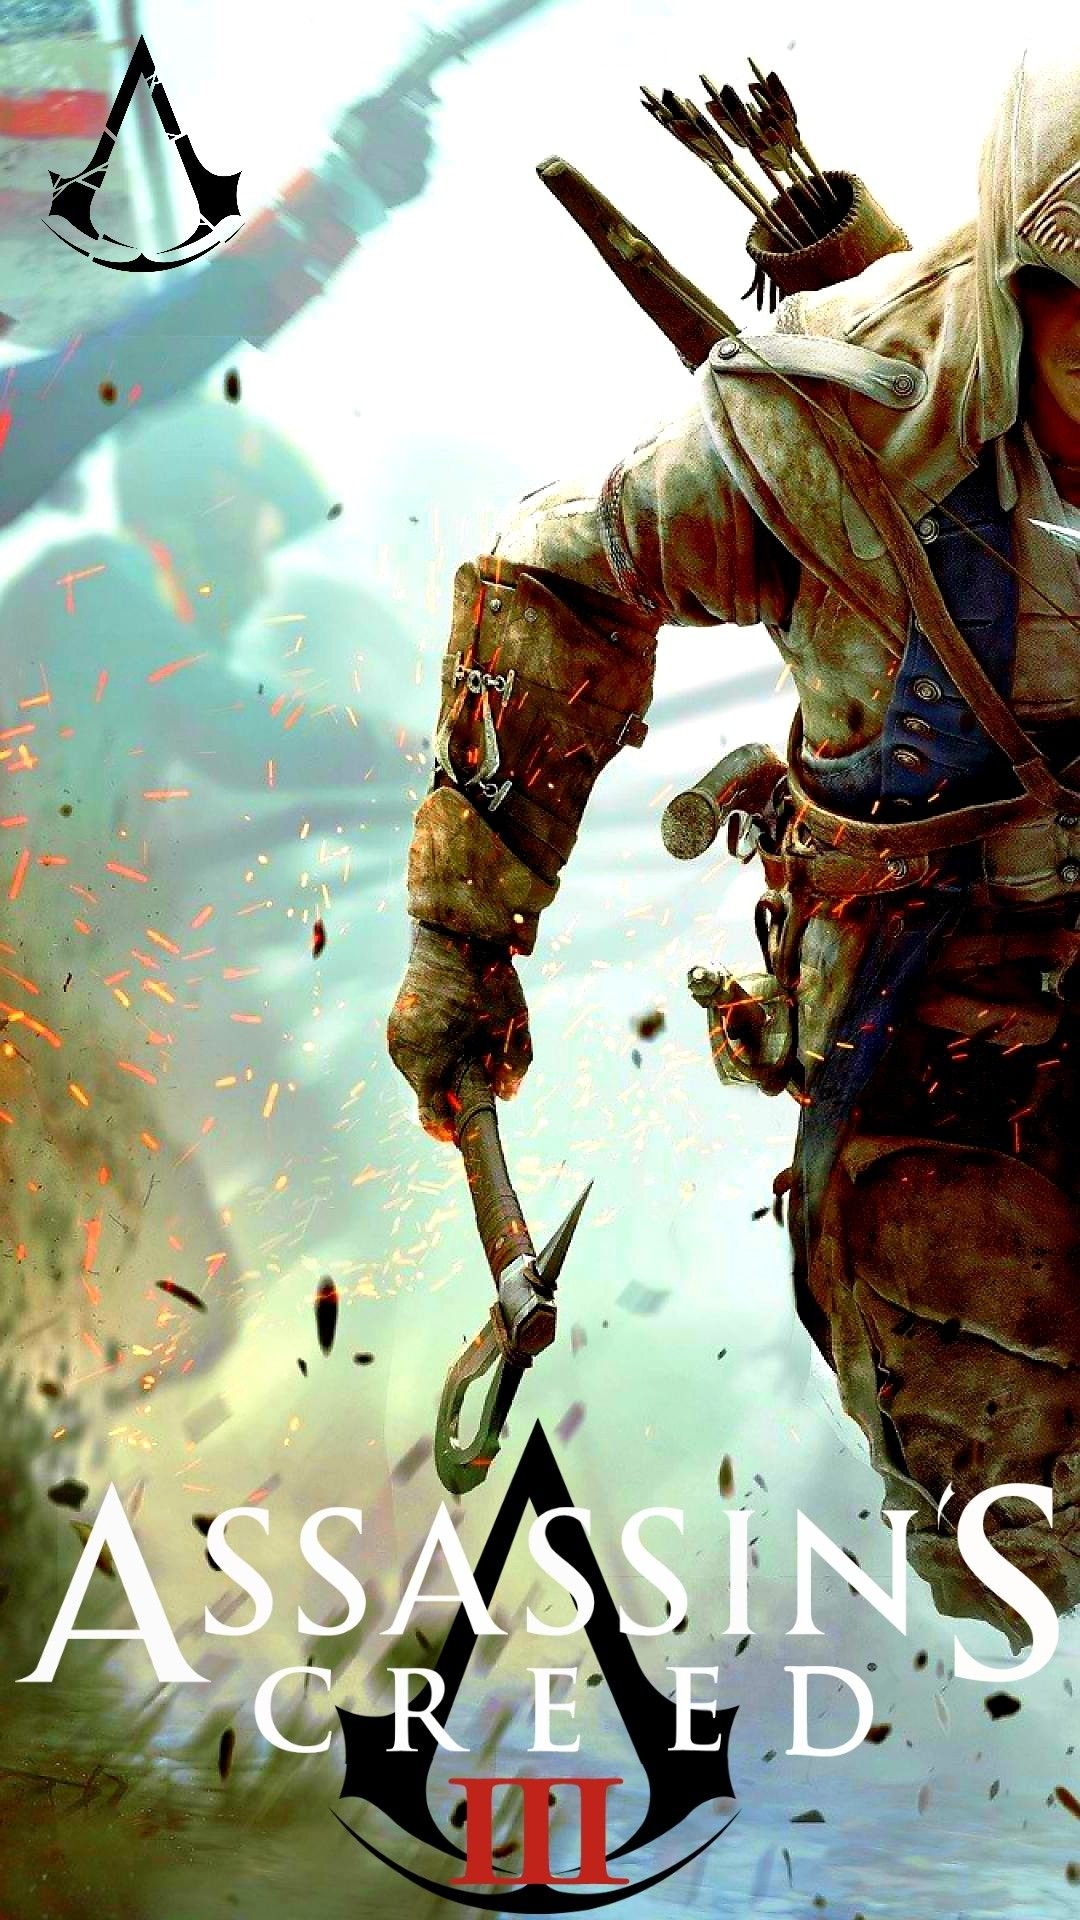 Ac 3 Wallpaper Hd Assassins Creed 3 Assassins Creed Assassin S Creed